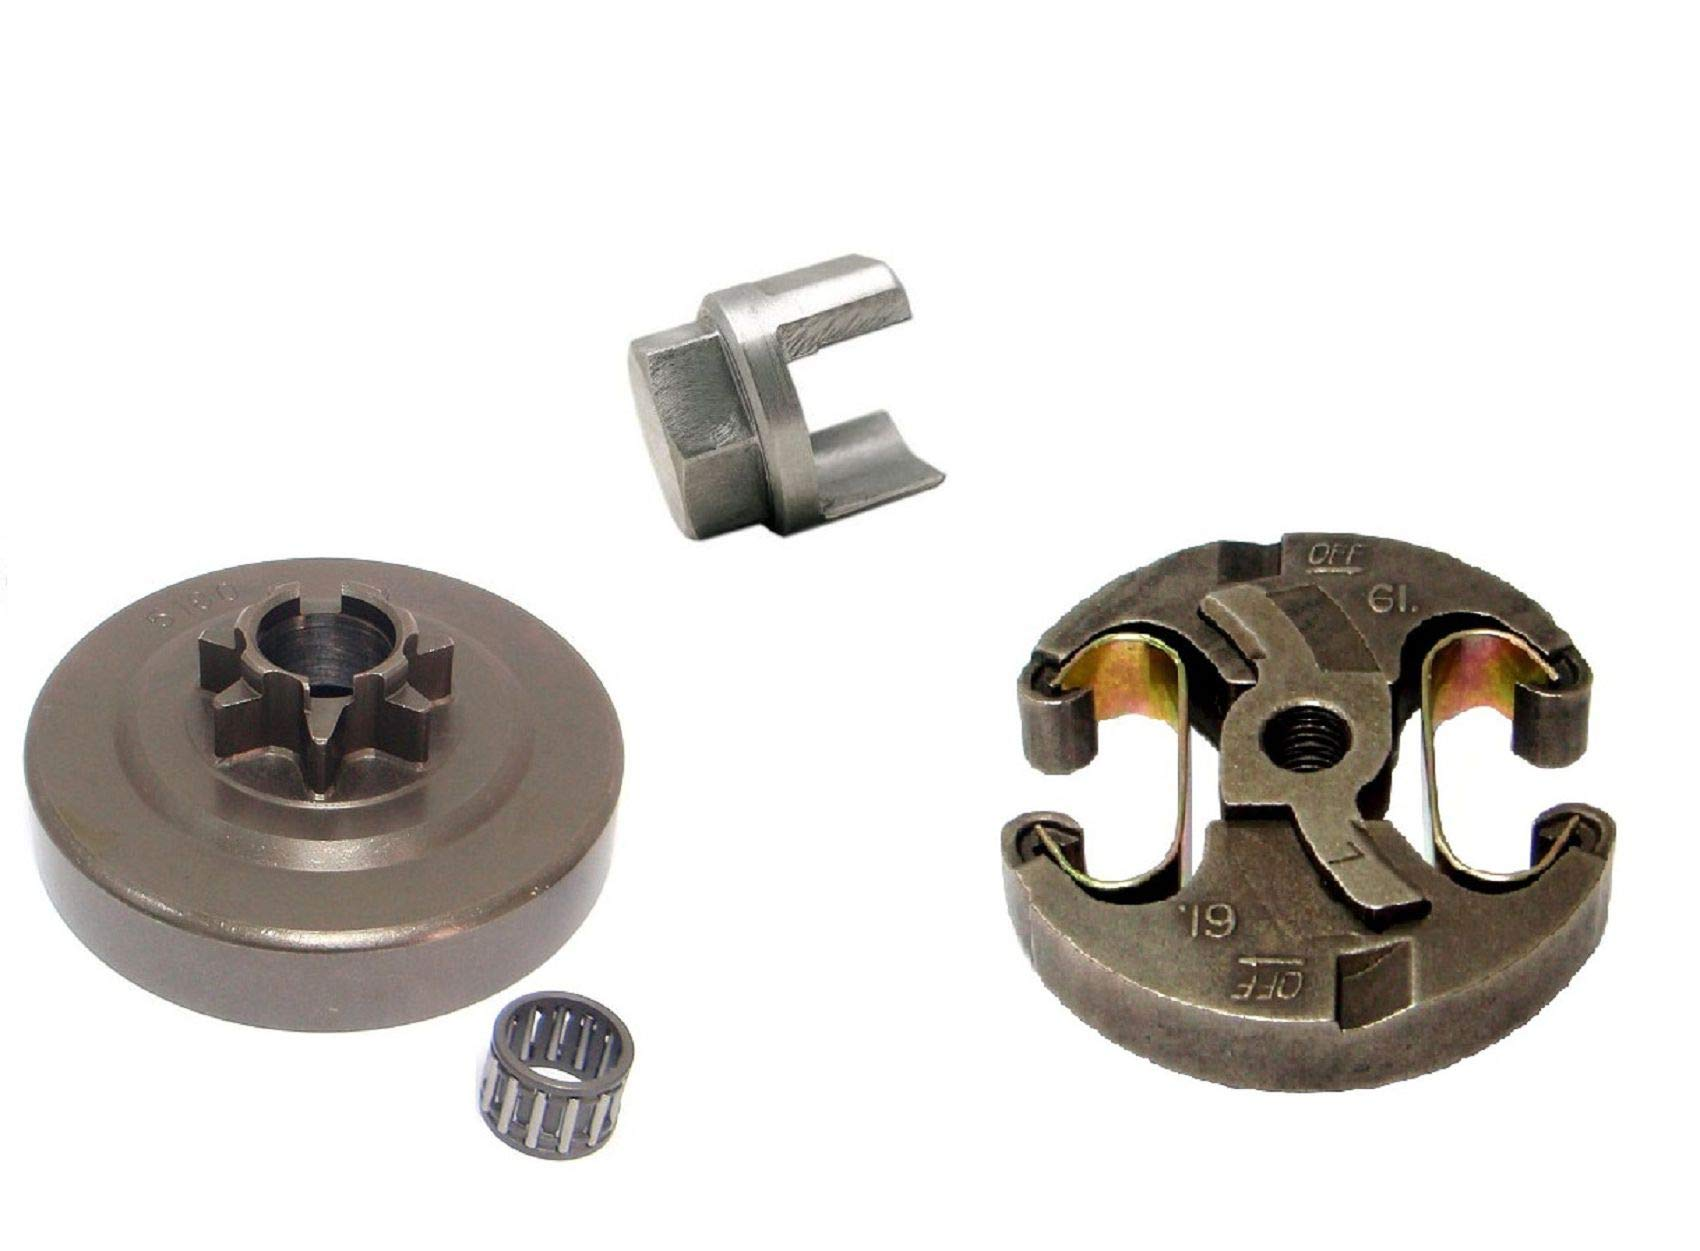 SPERTEK Clutch + Sprocket Drum .325'' 7T + Removal Tool for Husqvarna 455, 460, 461 Rep 537 29 17-02 by SPERTEK